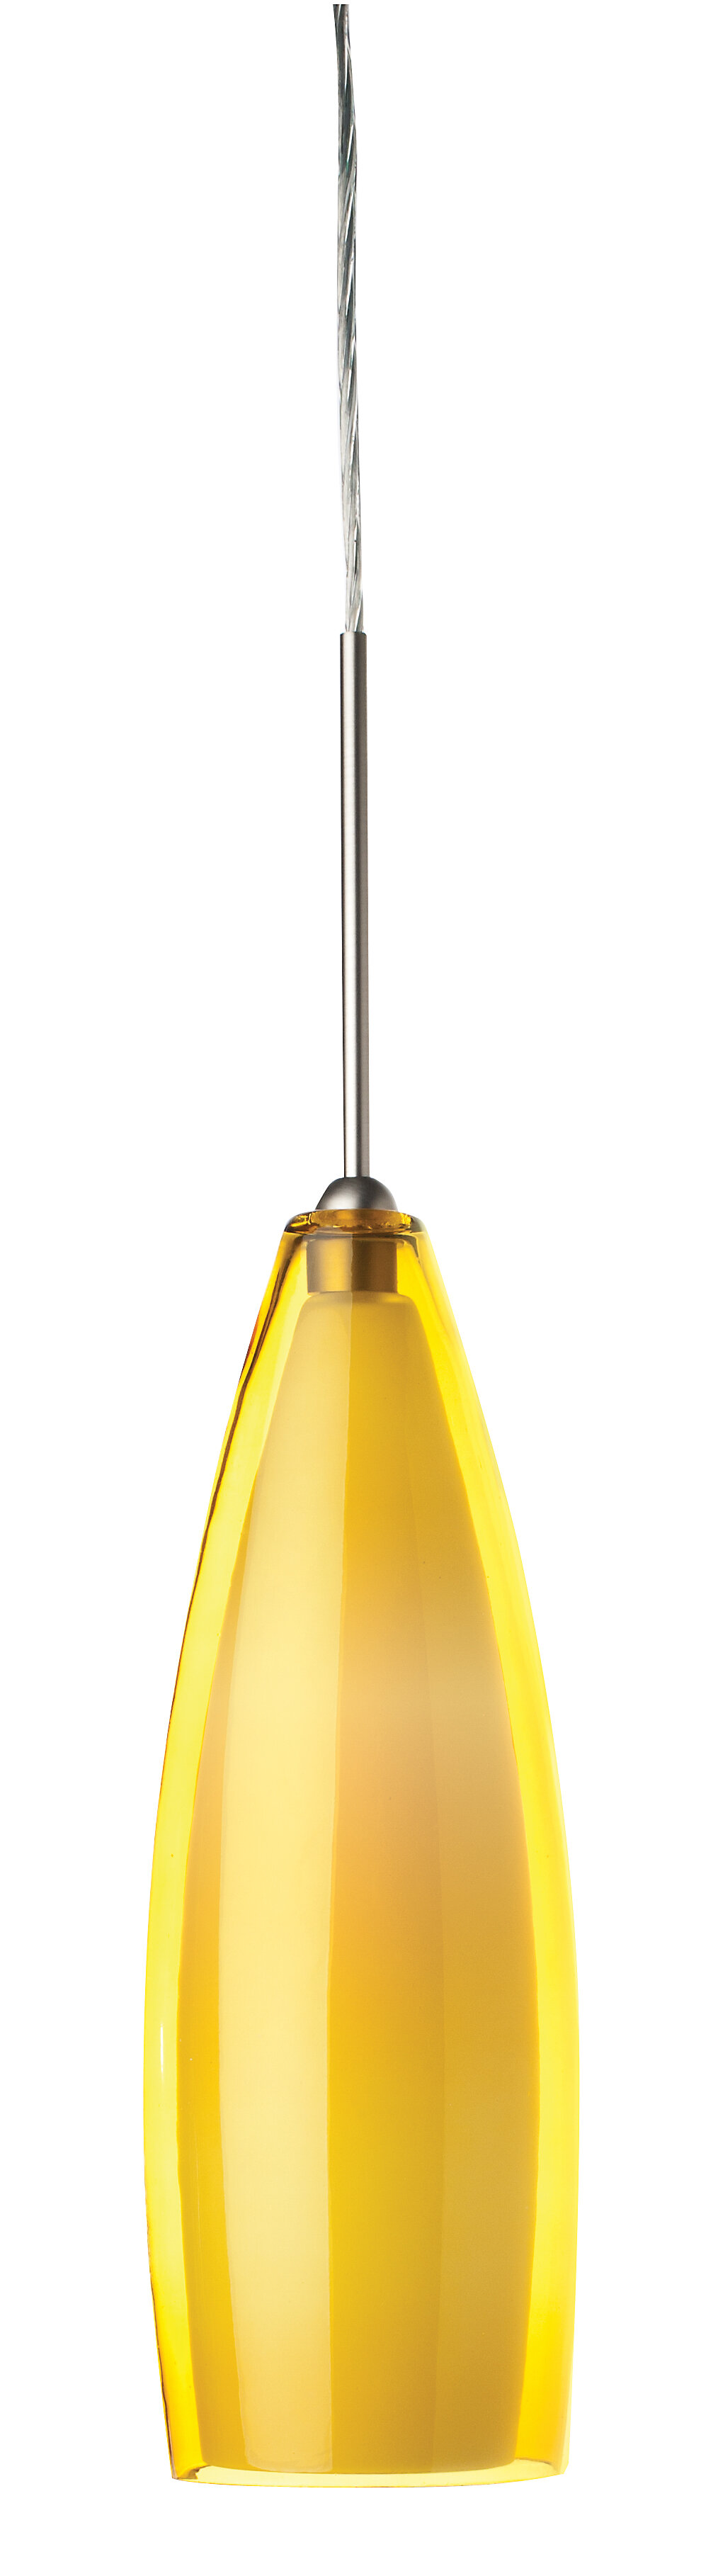 Cone Mini Less Than 6 Wide Pendant Lighting You Ll Love In 2021 Wayfair